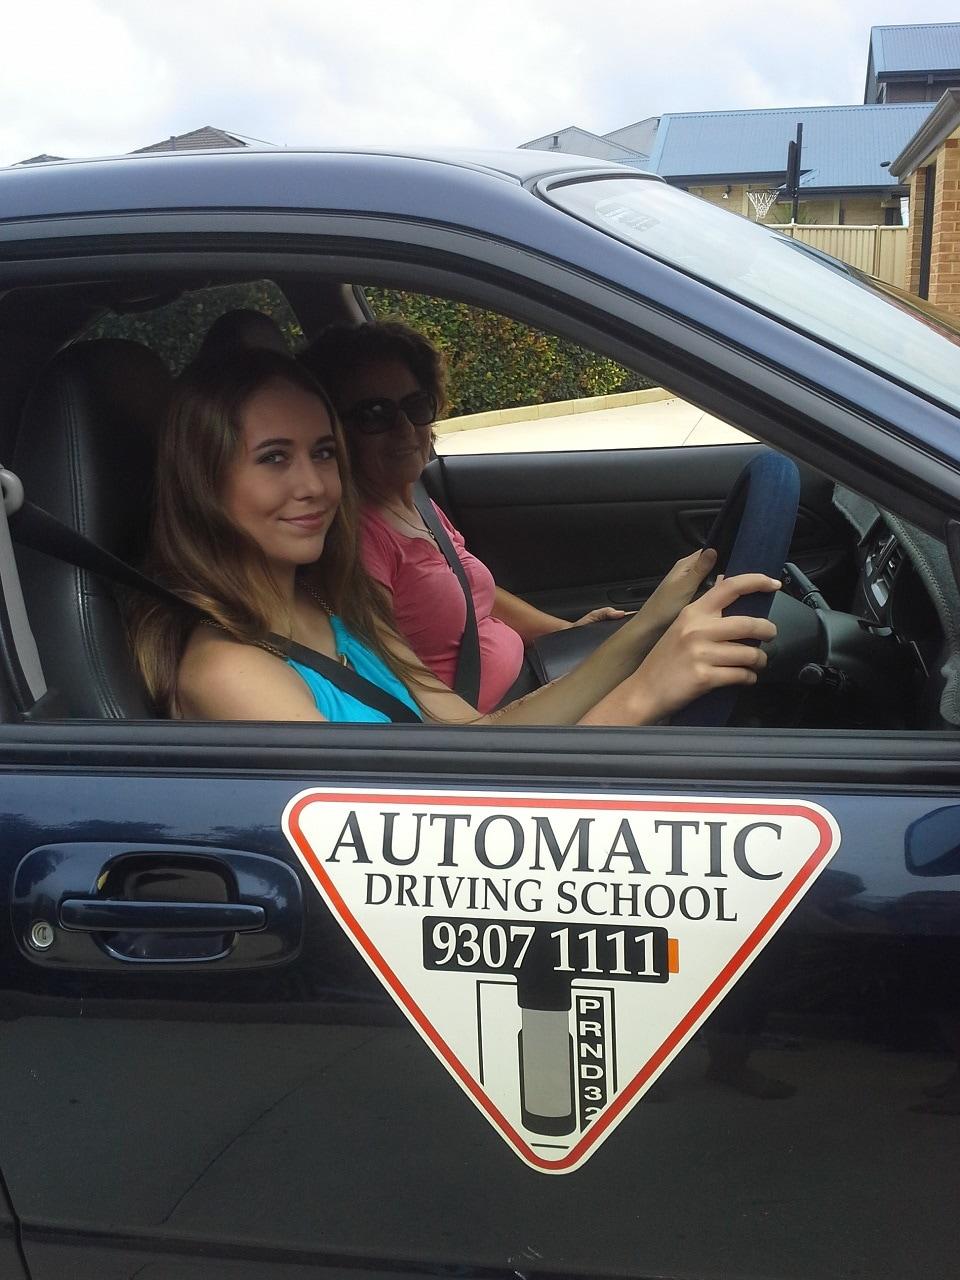 Automatic driving school on 5 beilken way clarkson wa for Motor city driving school